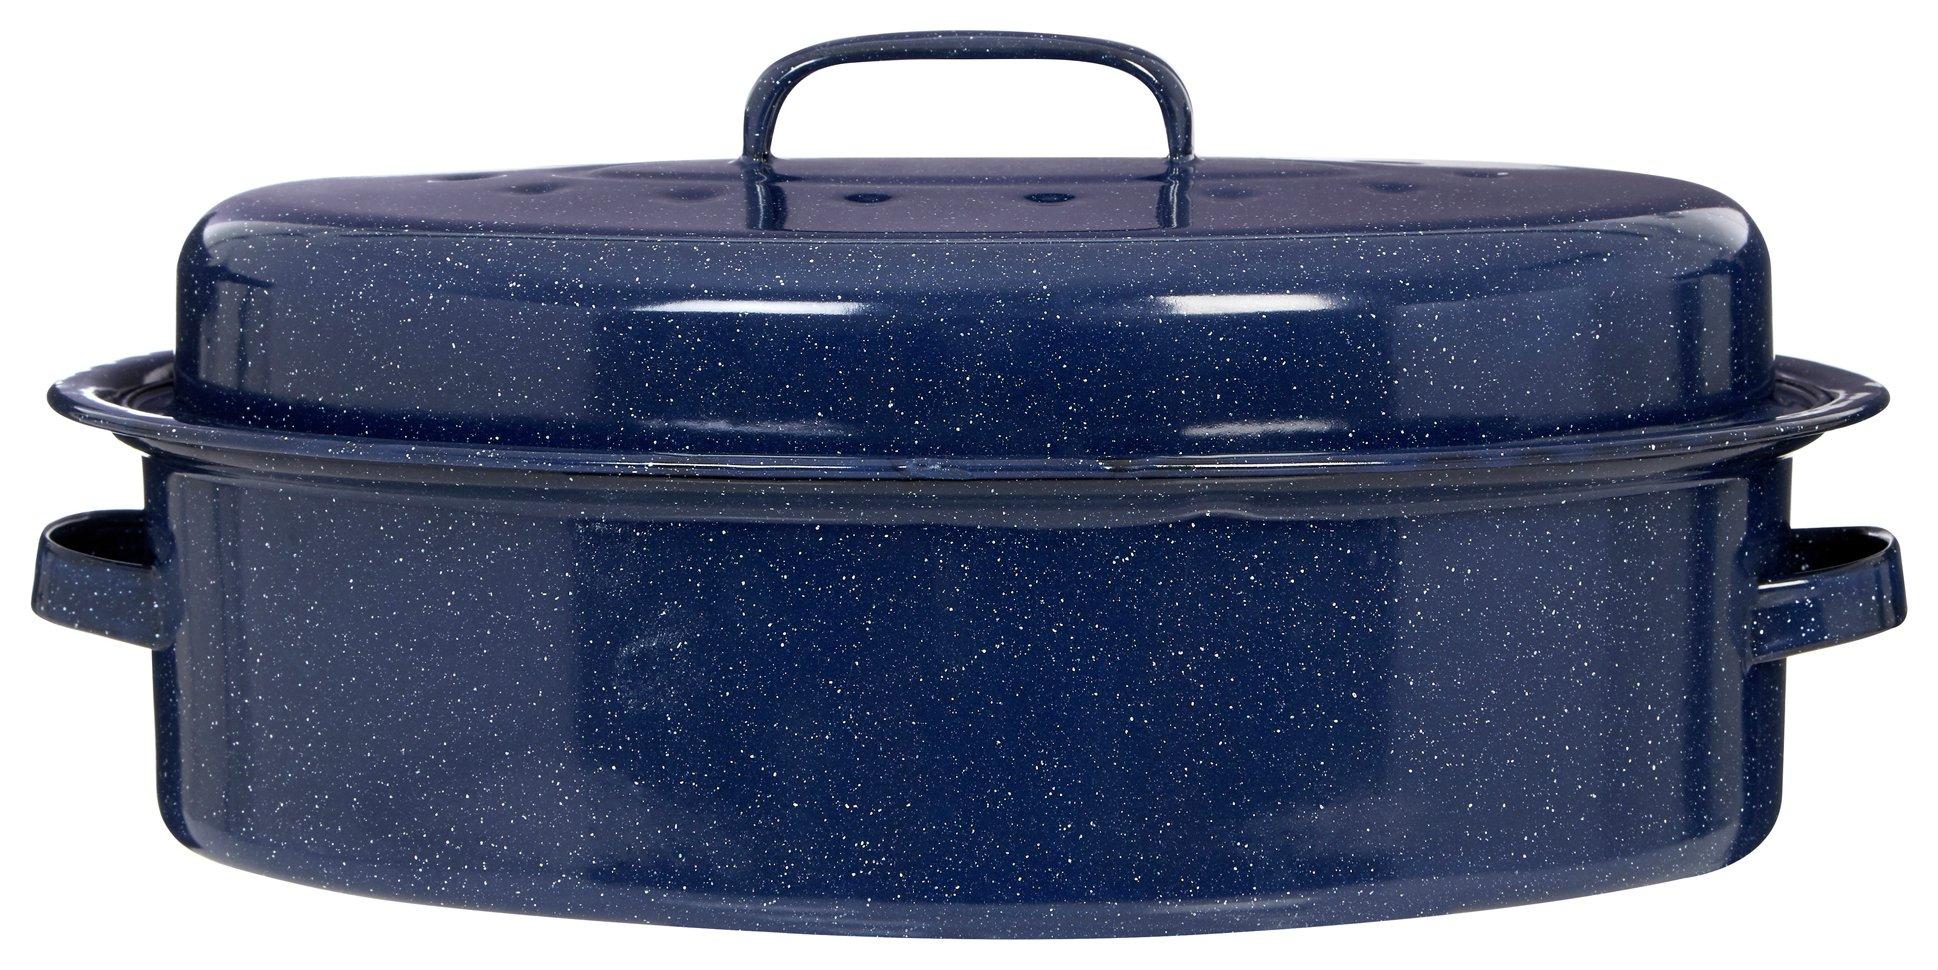 Image of Premier Housewares Enamel Oval Roaster with Lid - Blue.